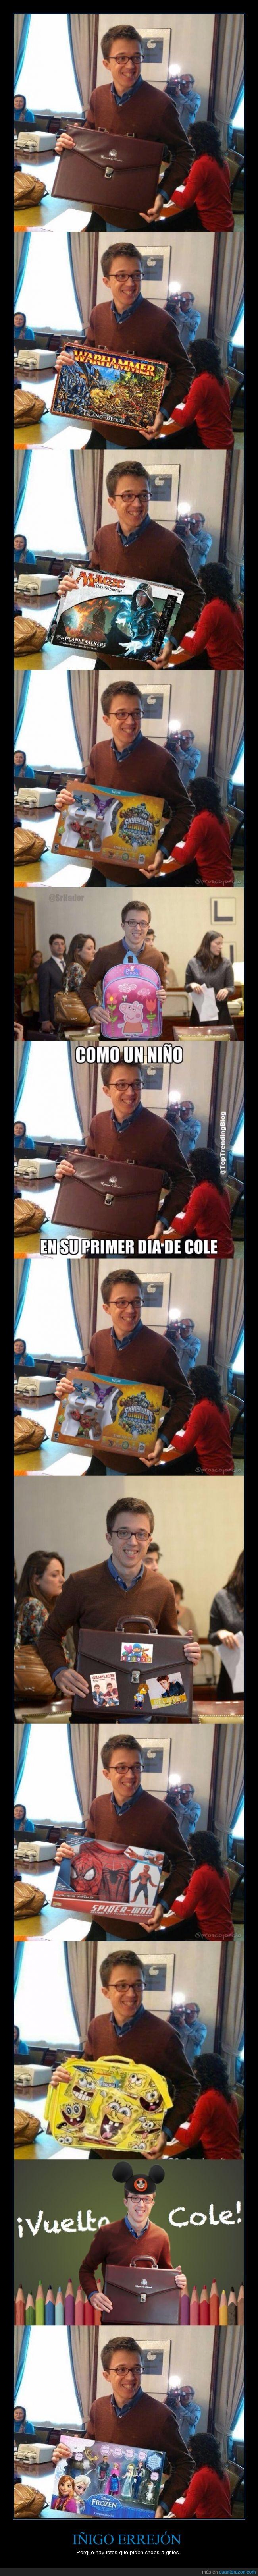 cartera,frozen,Iñigo Errejon,juguete,mochila,muñeco,política,regalo,reyes